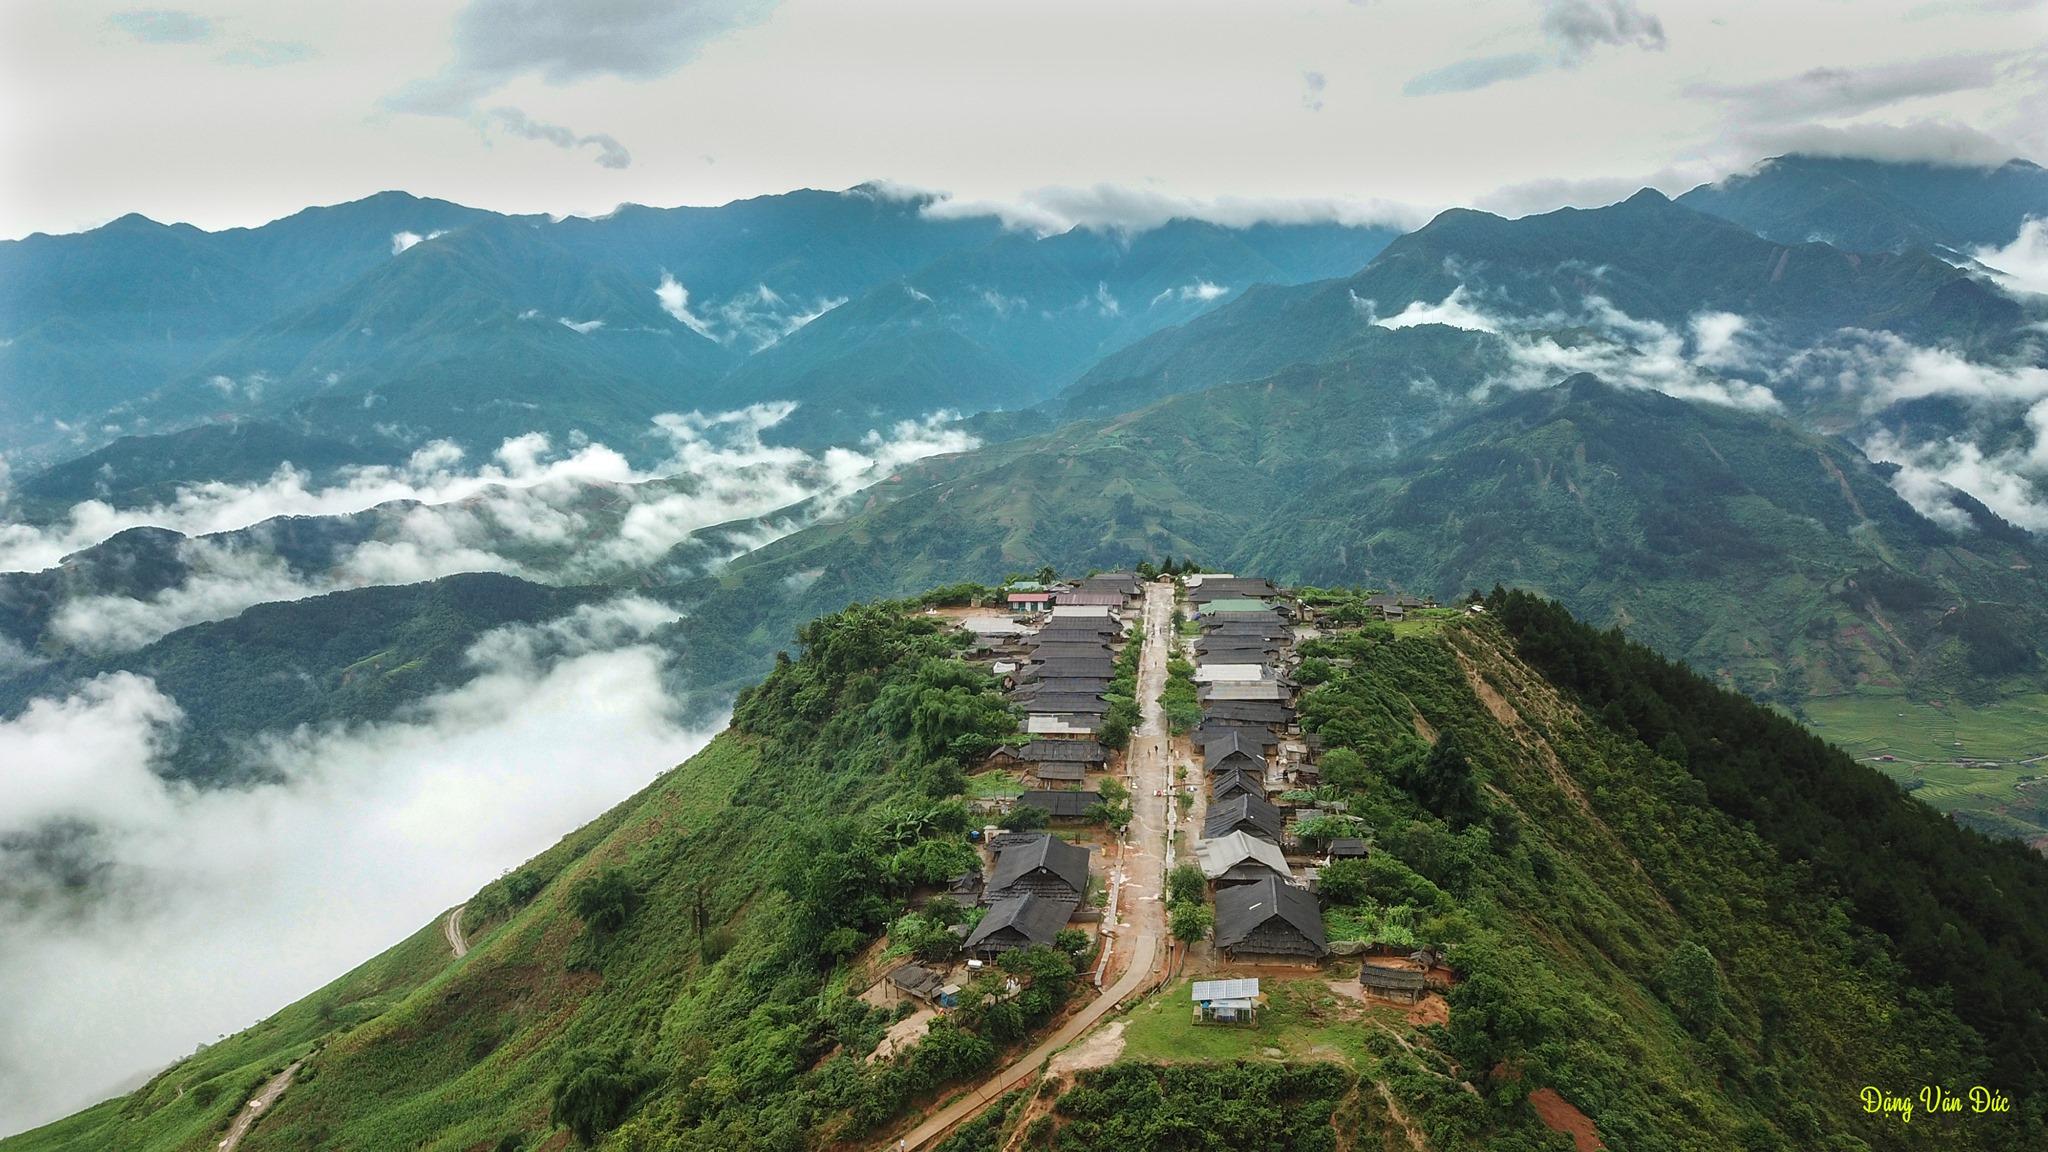 Tong-hop-nhung-dia-diem-du-lich-nui-hot-nhat-trong-dip-30-thang-4-vietmountain-travel0968011234